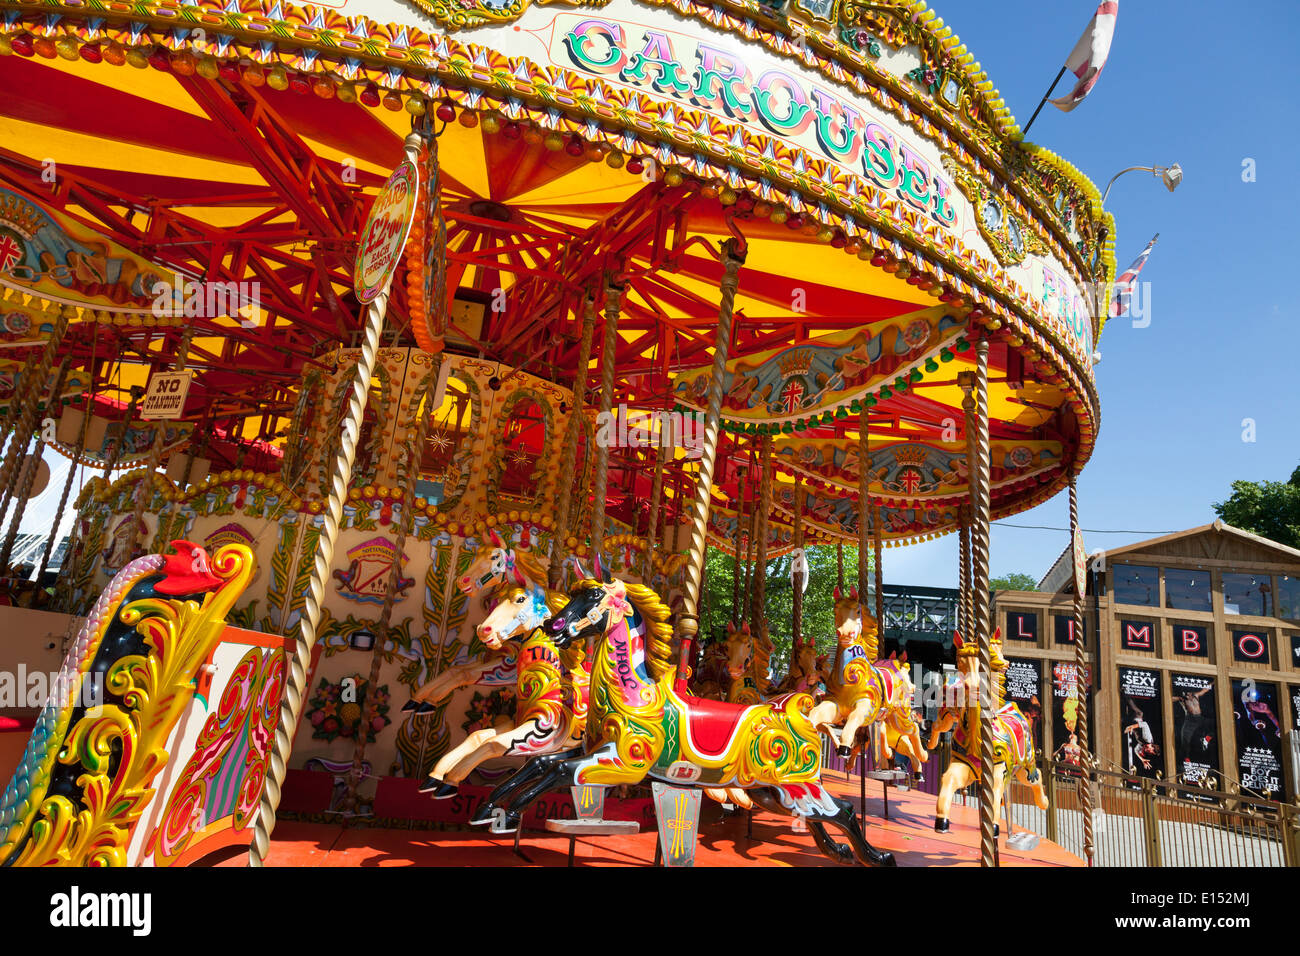 Desocupado carrusel tradicional feria ride. Imagen De Stock